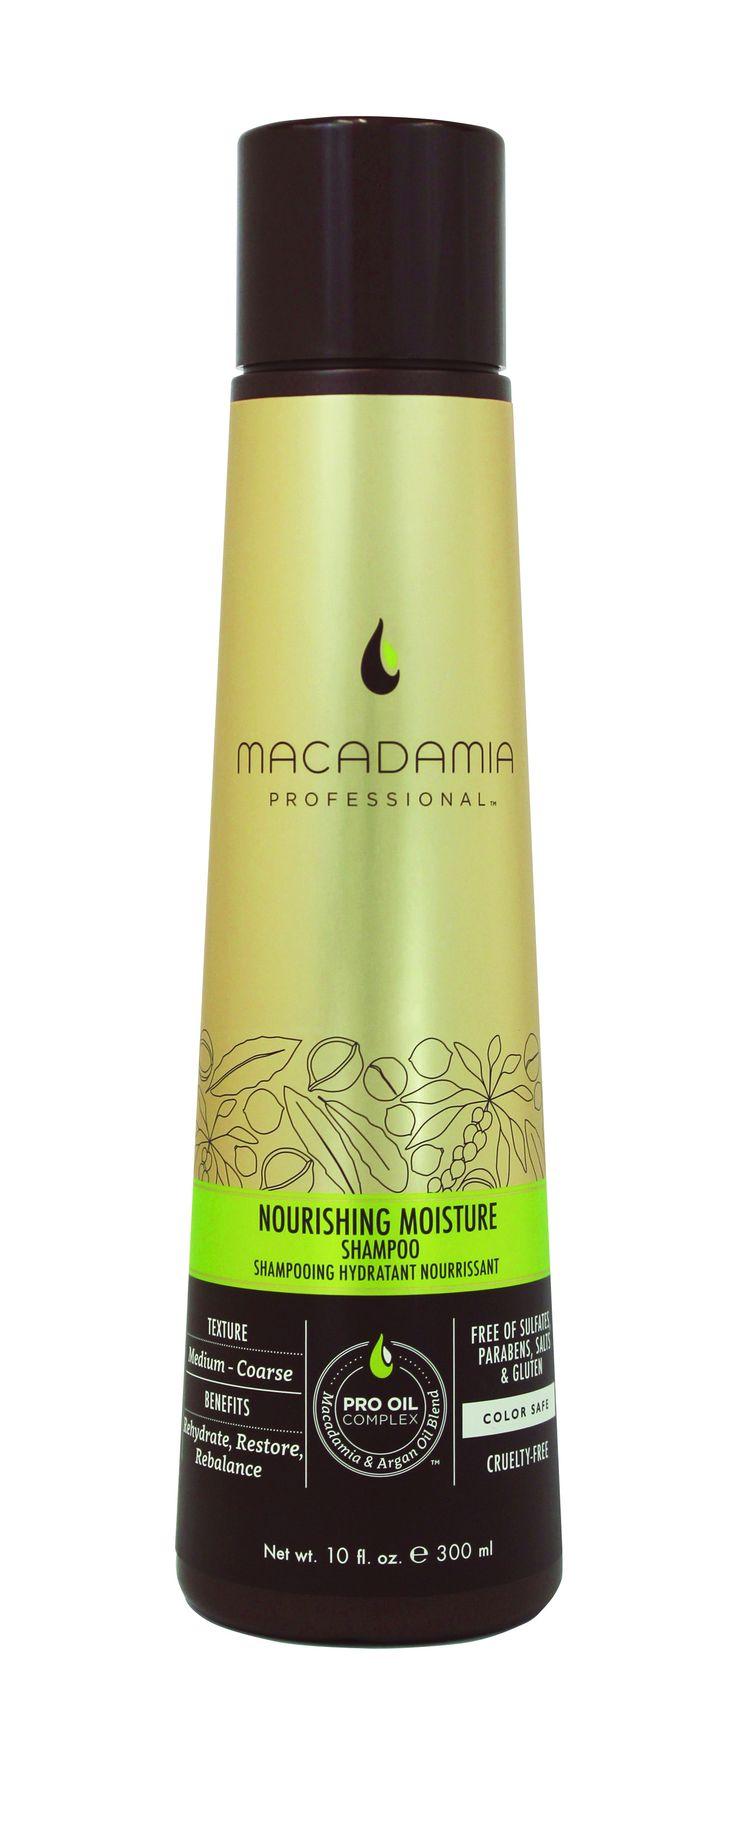 Macadamia Professional Nourishing Moisture Shampoo 300ml.